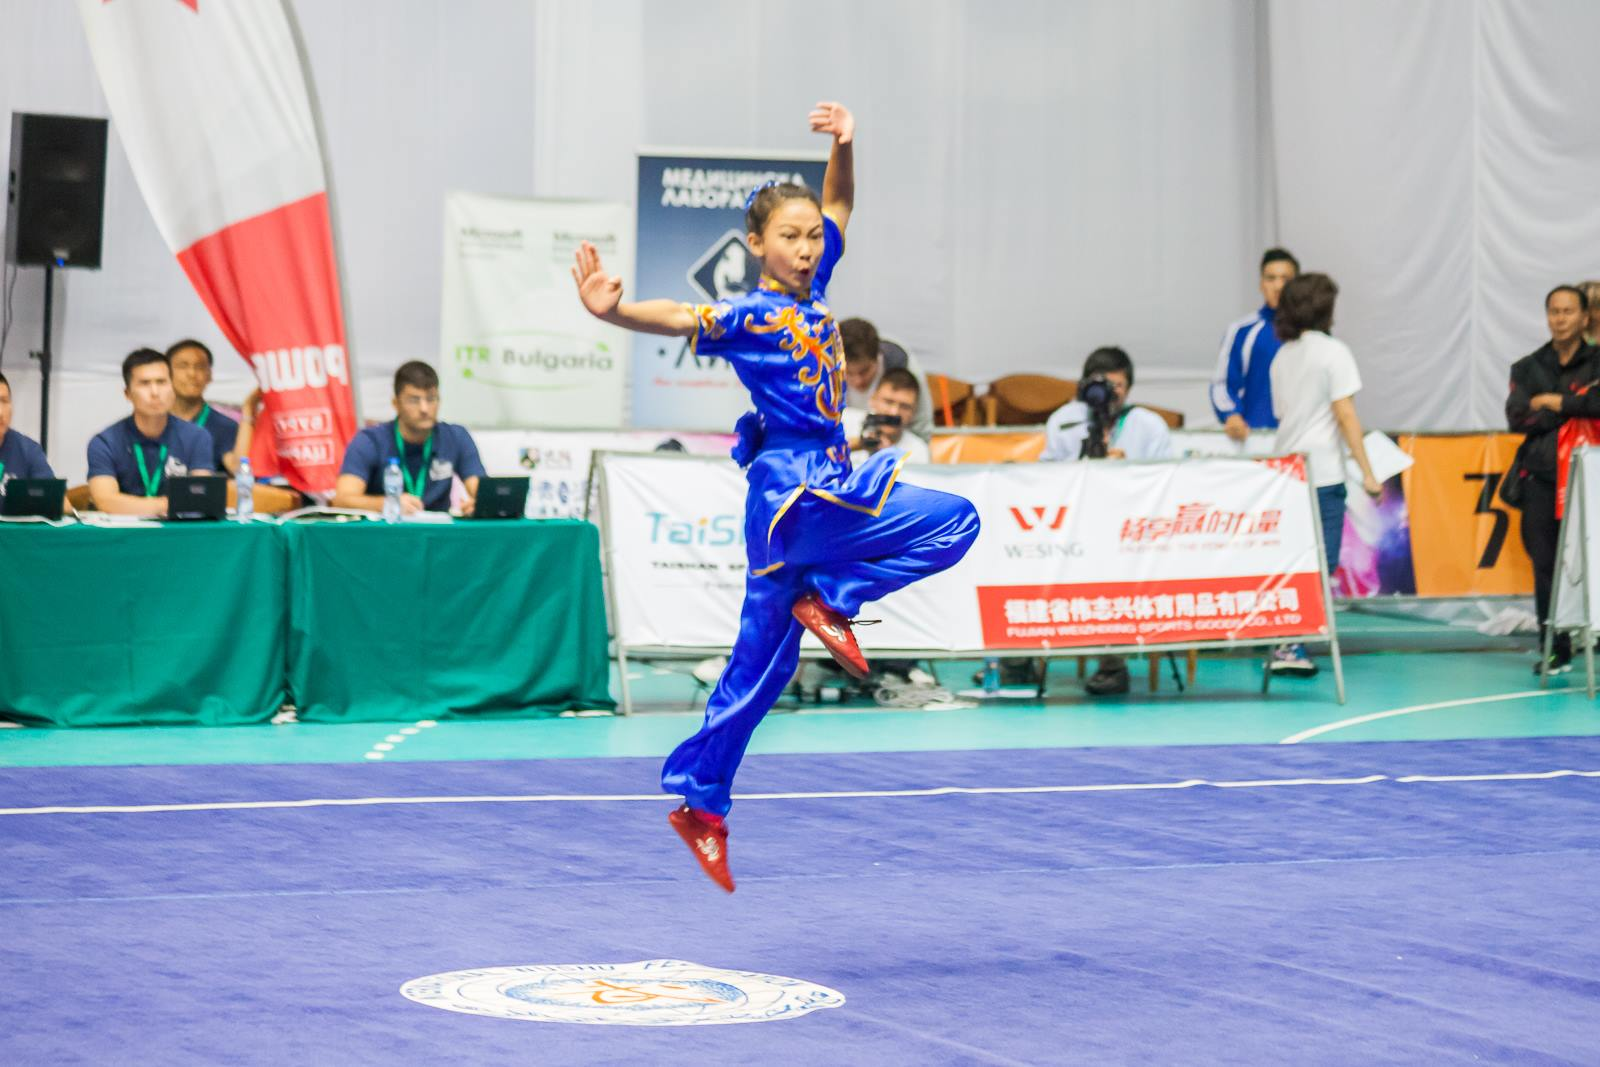 Wayland_Li_World_Wushu_Championships_Changquan_Longfist_2016_Bulgaria_Canada.jpg